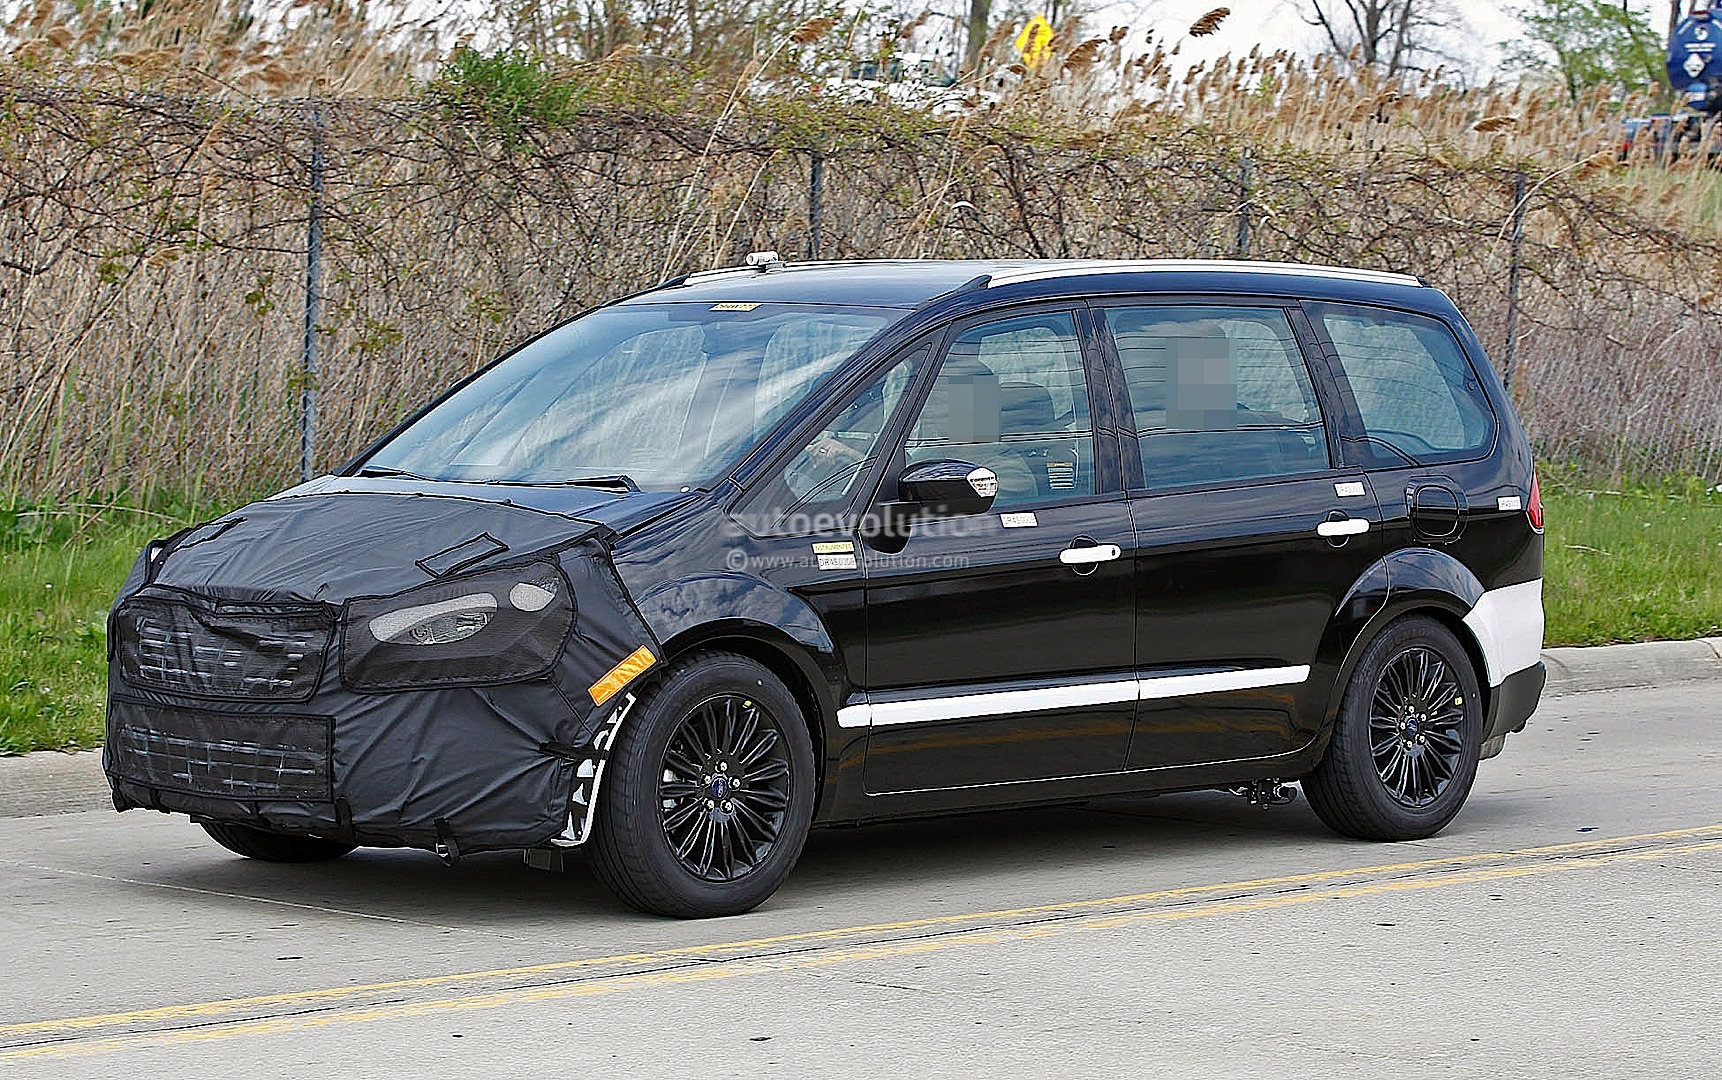 Spyshots: Ford Galaxy MPV Mule